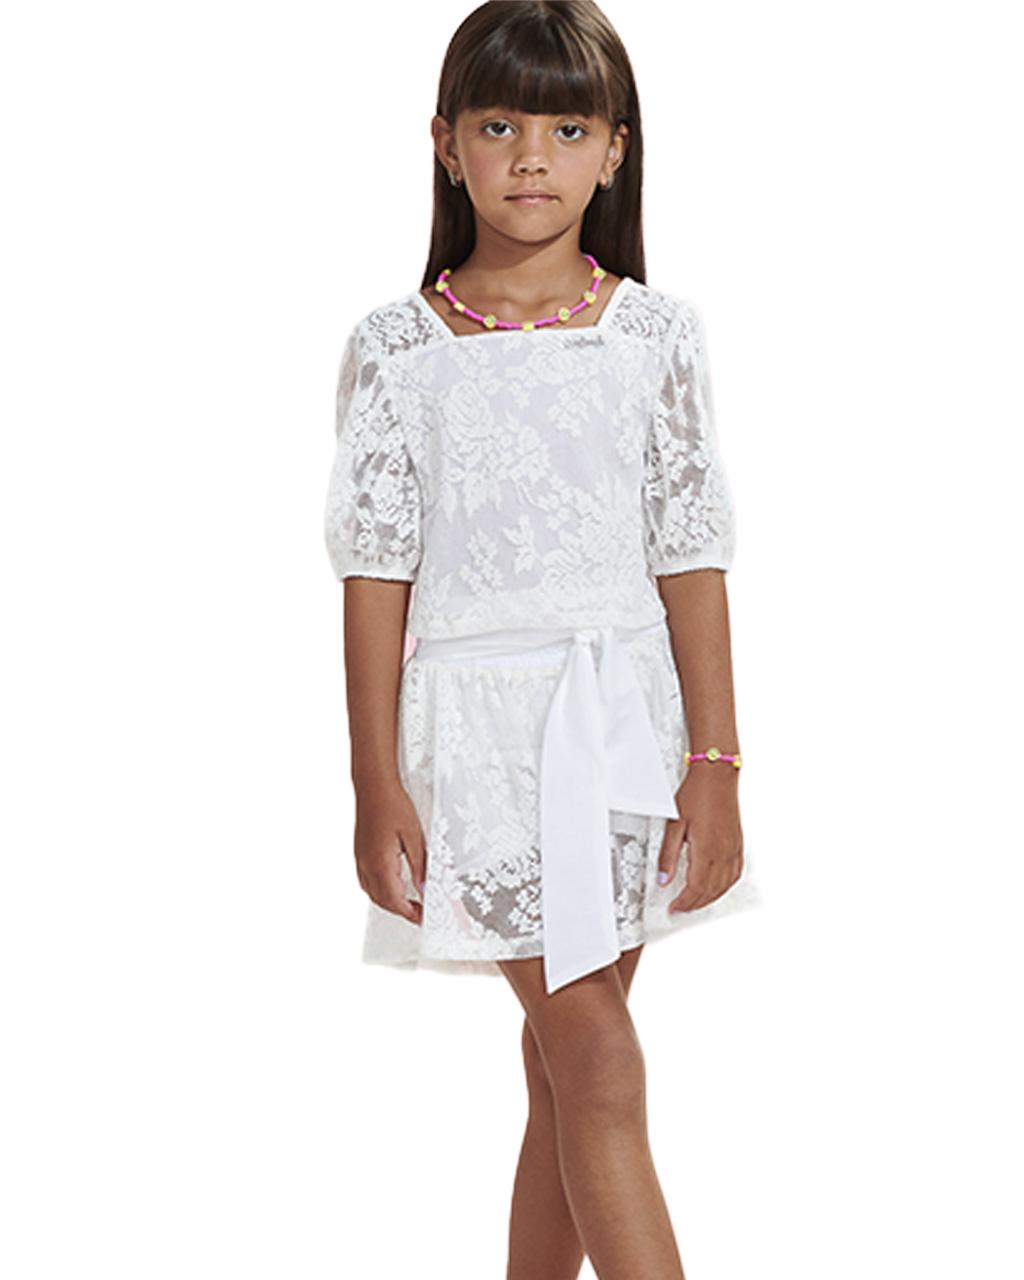 Conjunto Infantil Blusa Renda e Shorts Off White Animê